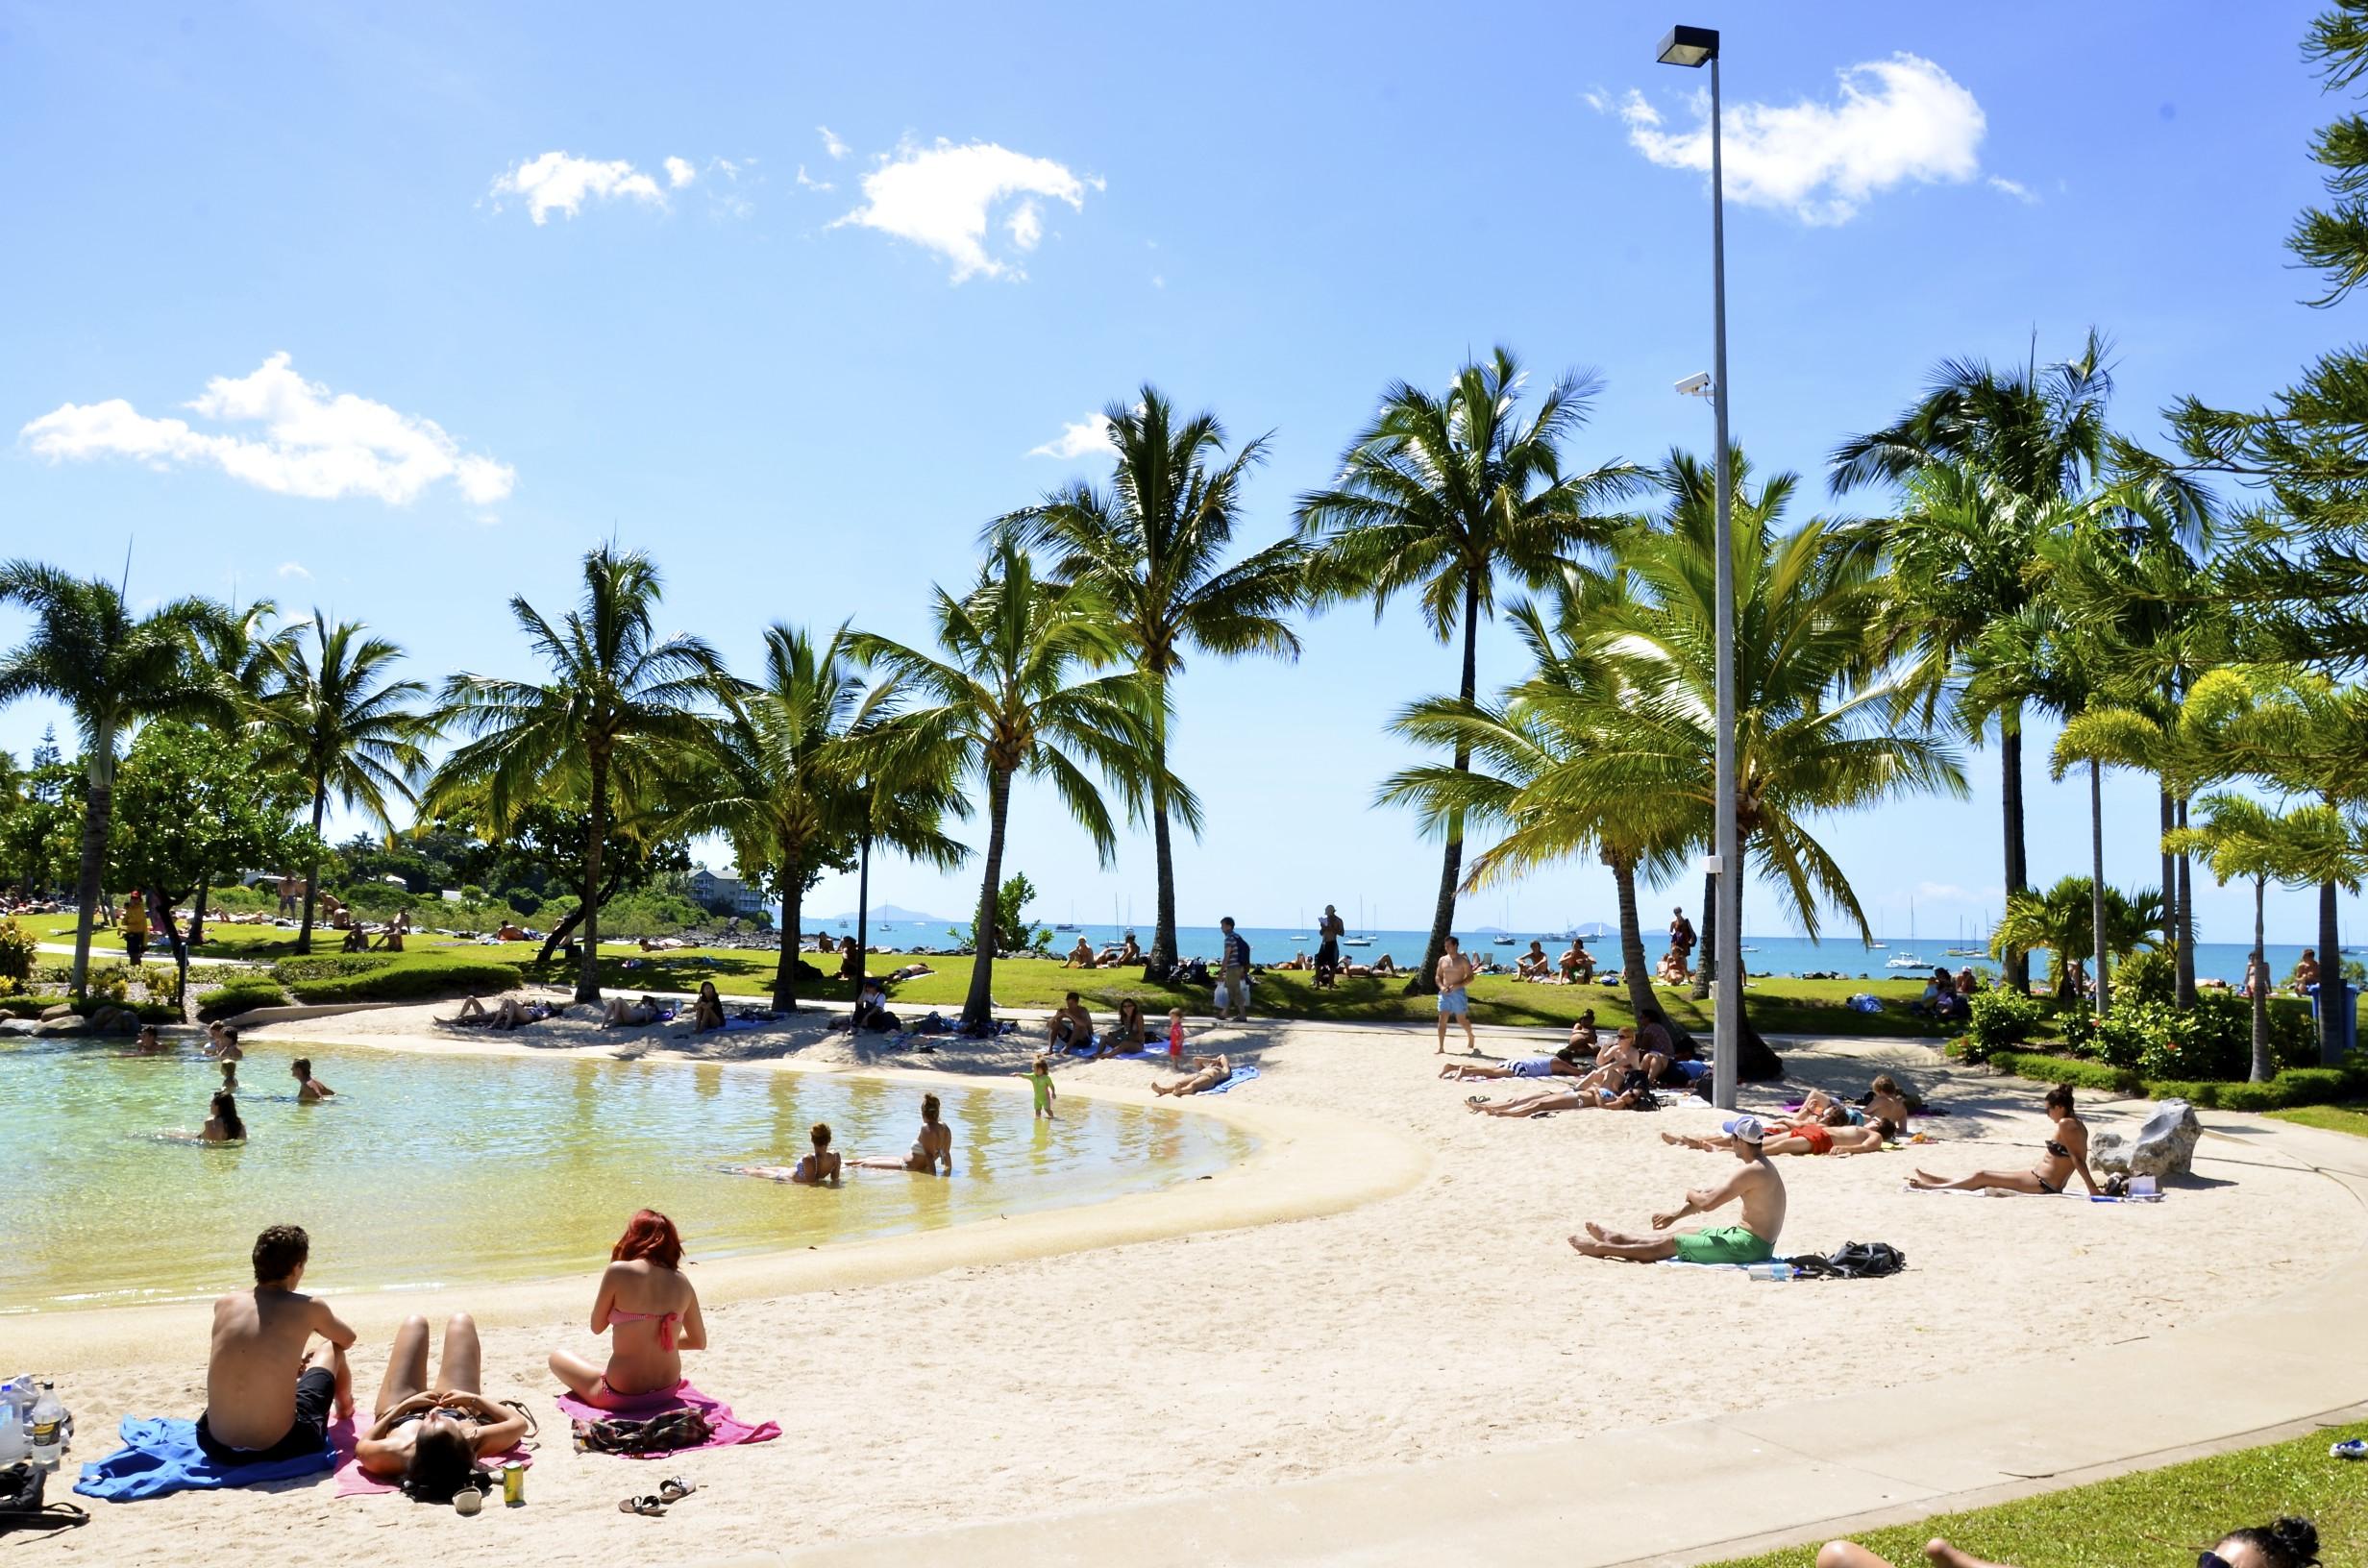 Case Design phone cases websites : Airlie Beach Queensland Australia : HD Walls : Find Wallpapers